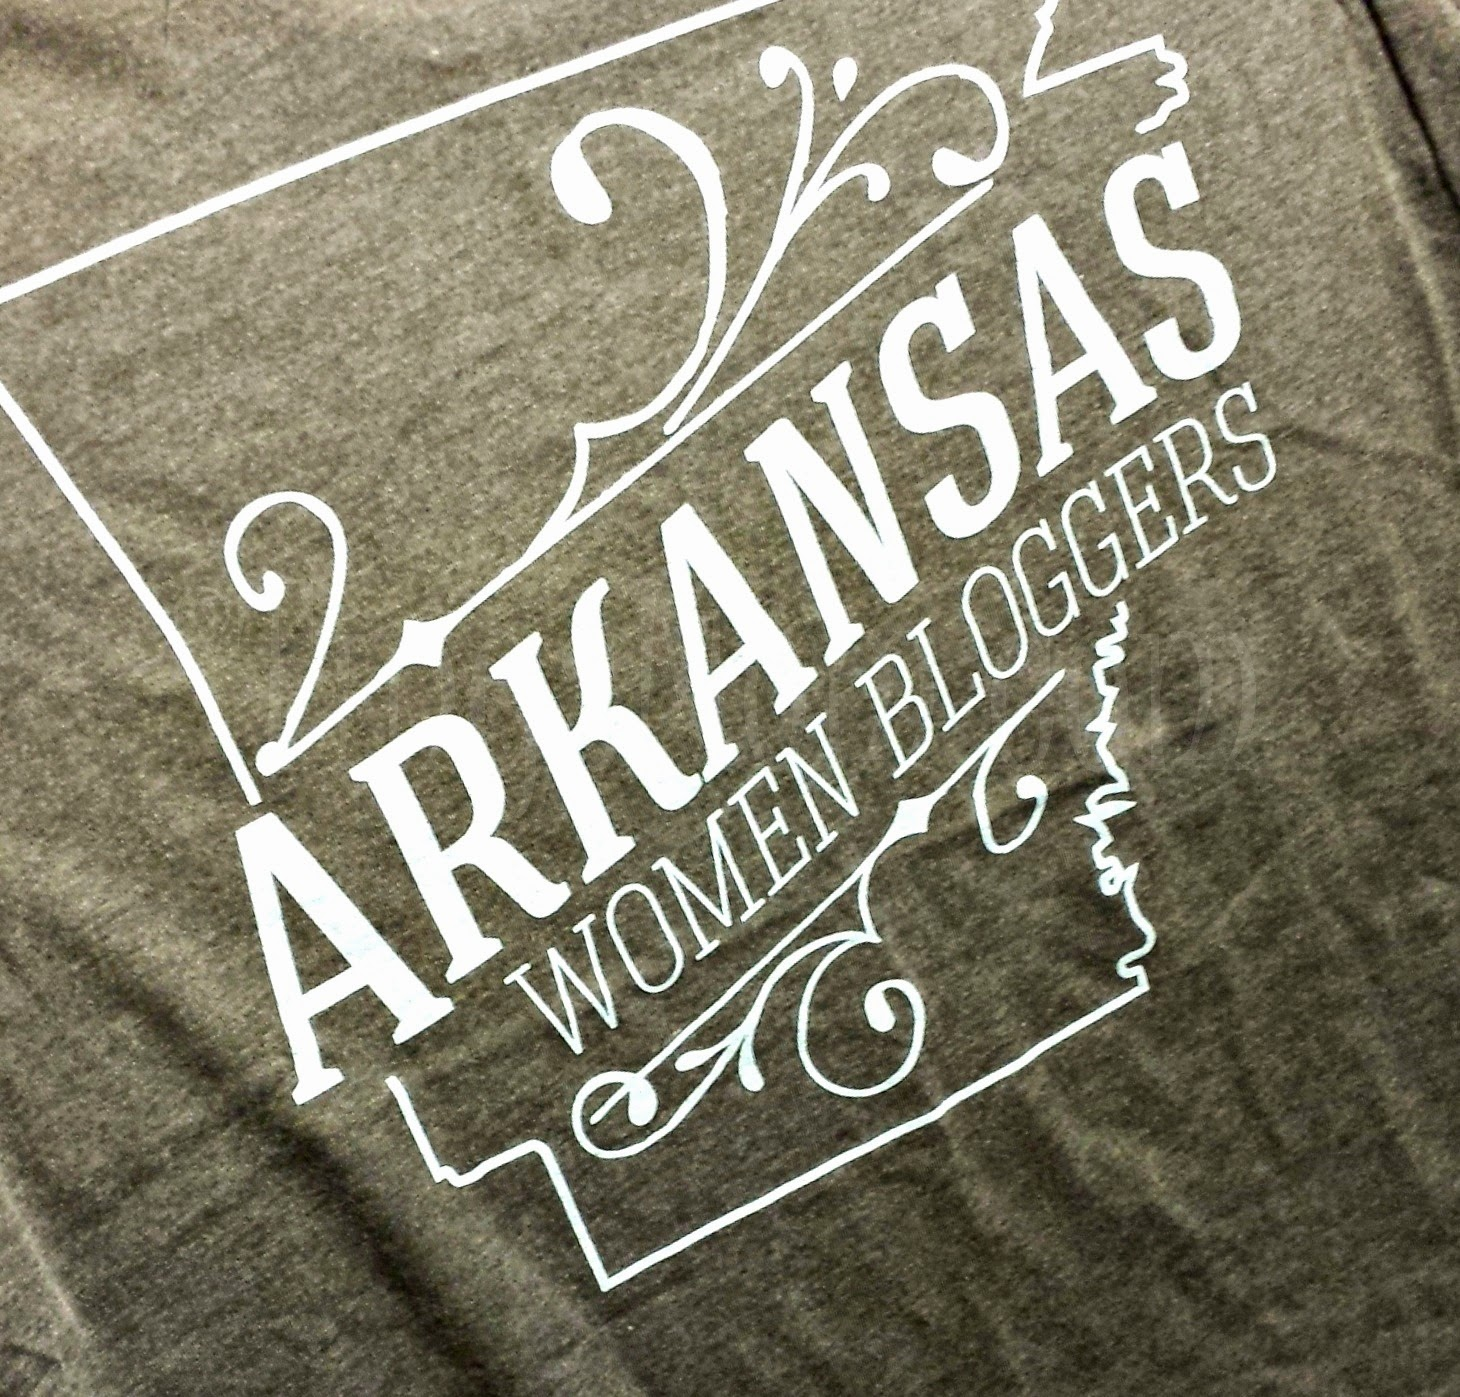 Arkansas Women Bloggers University | #awbu #blogconference #swarbloggers